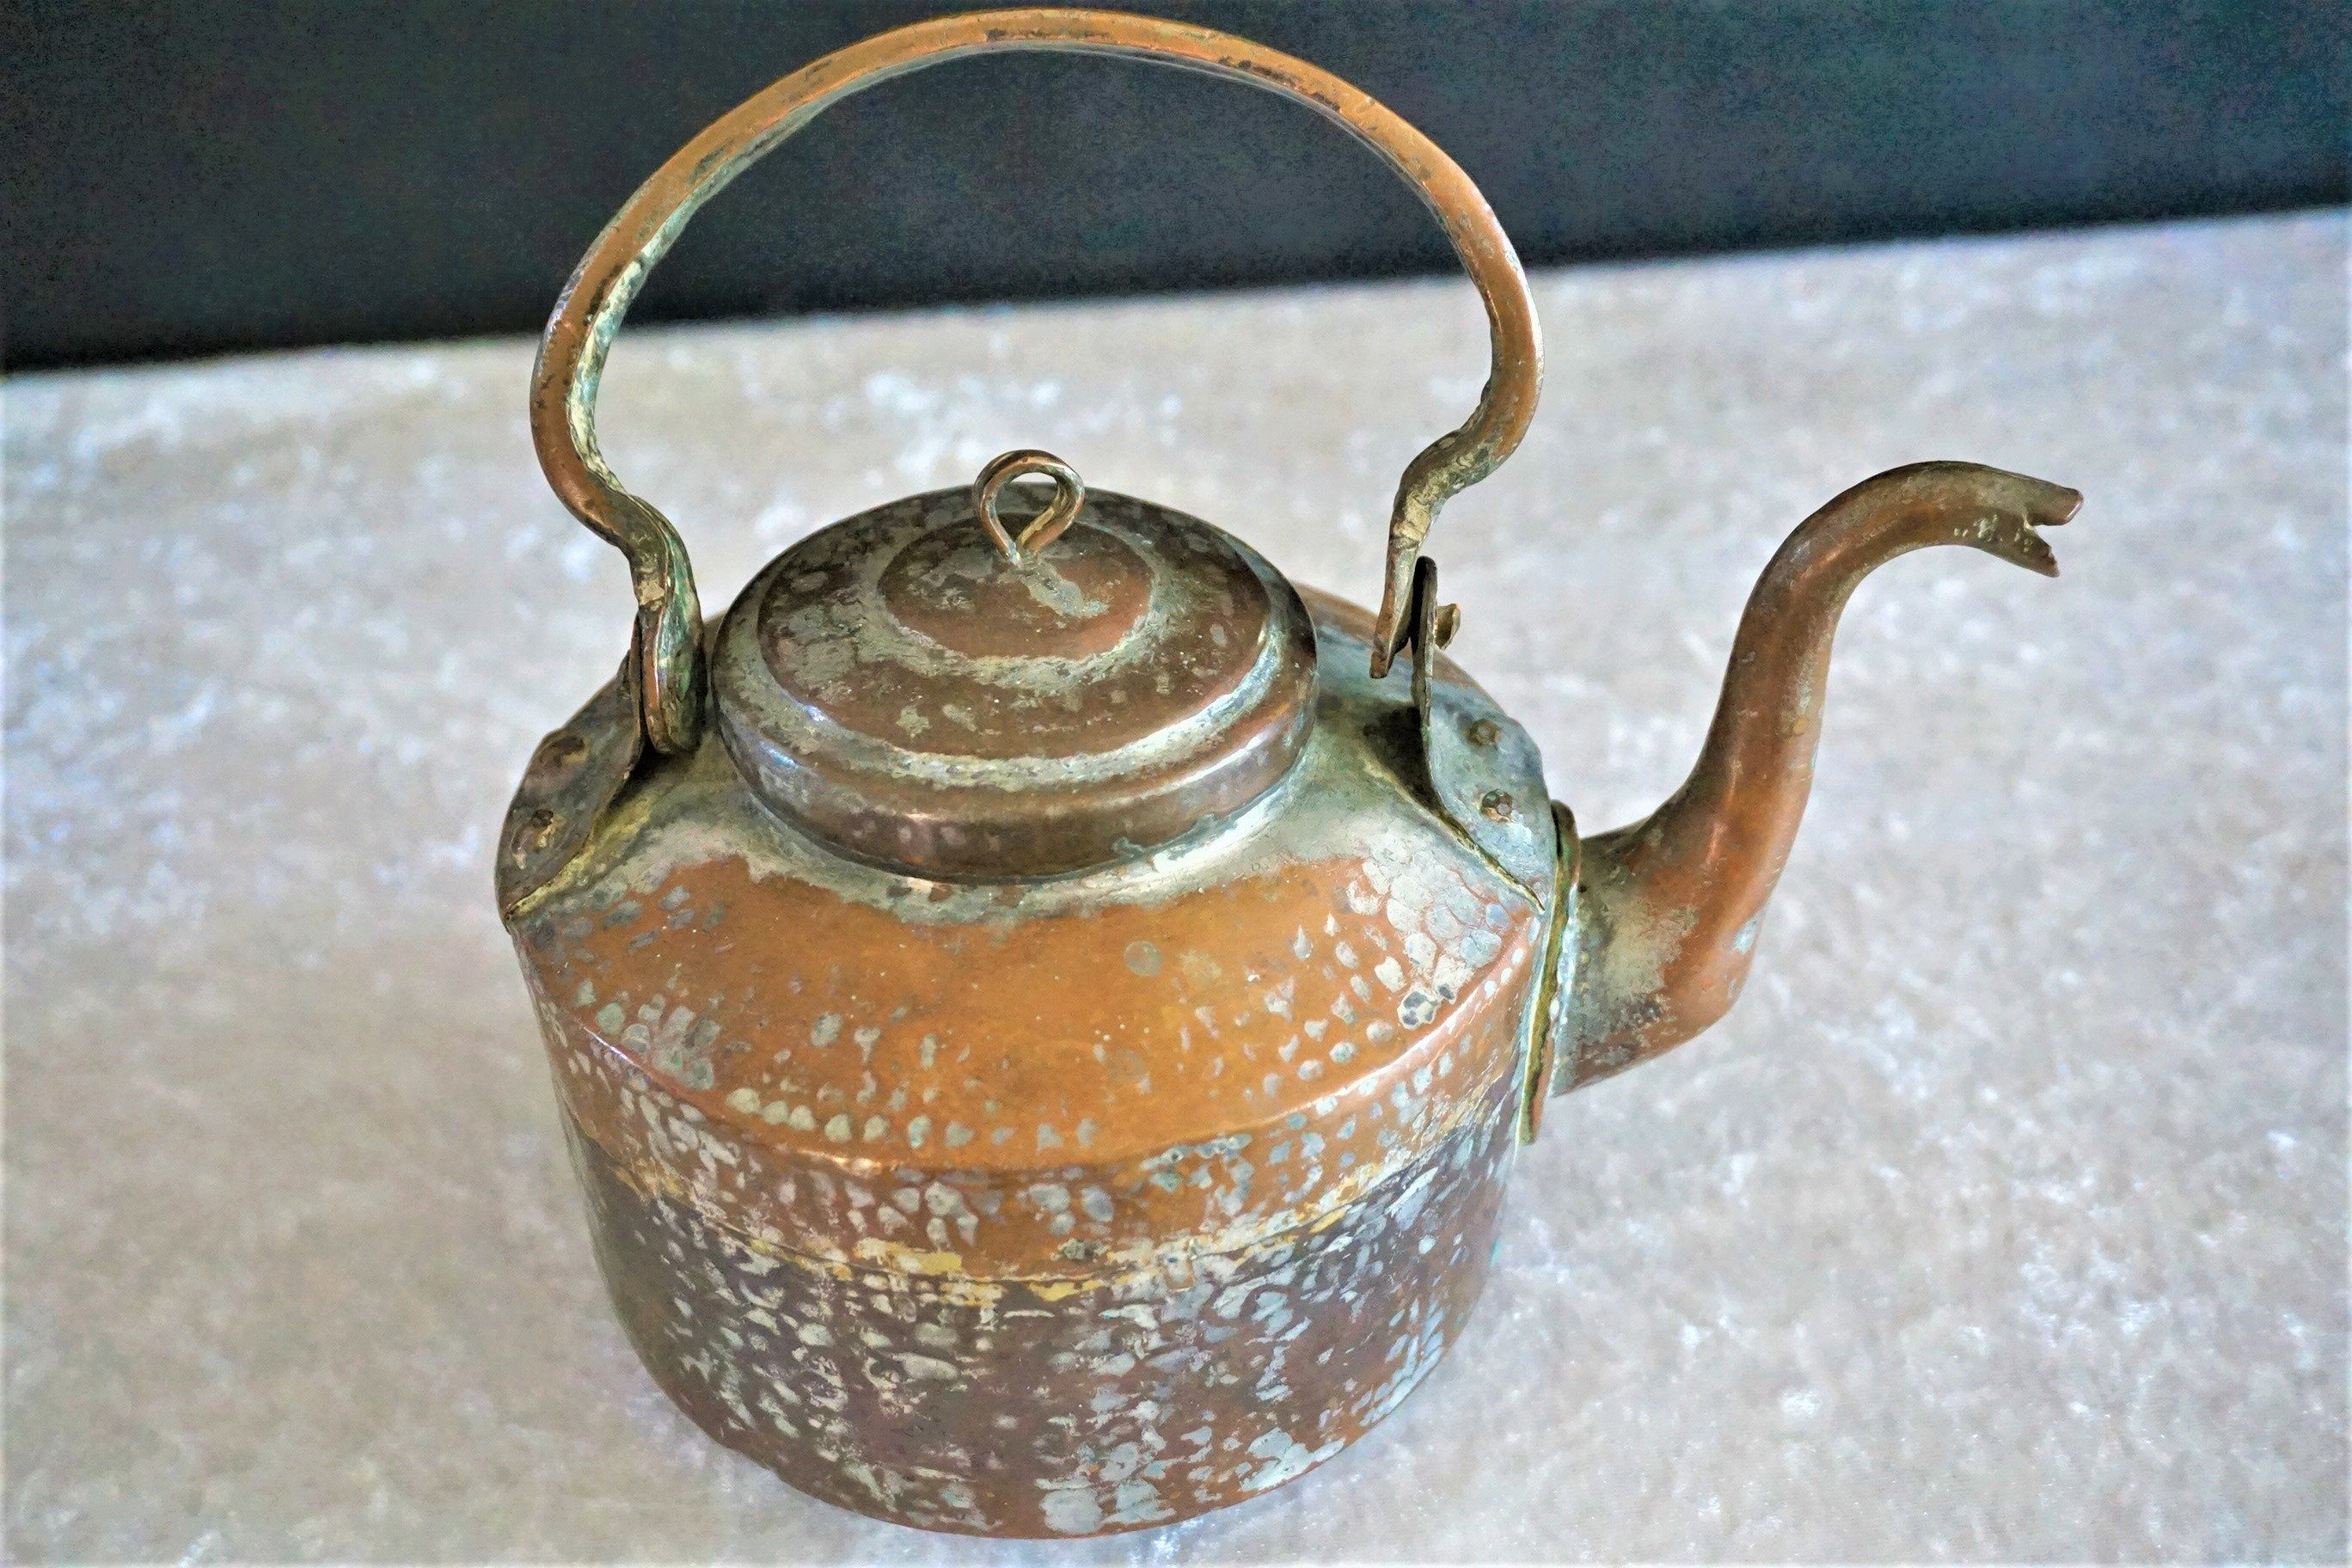 Pin By Matthew Voorhees On Antique Teapots Kettles Vintage Coffee Pot Antique Tea Vintage Coffee Wallpaper autumn hand picnic tea kettle